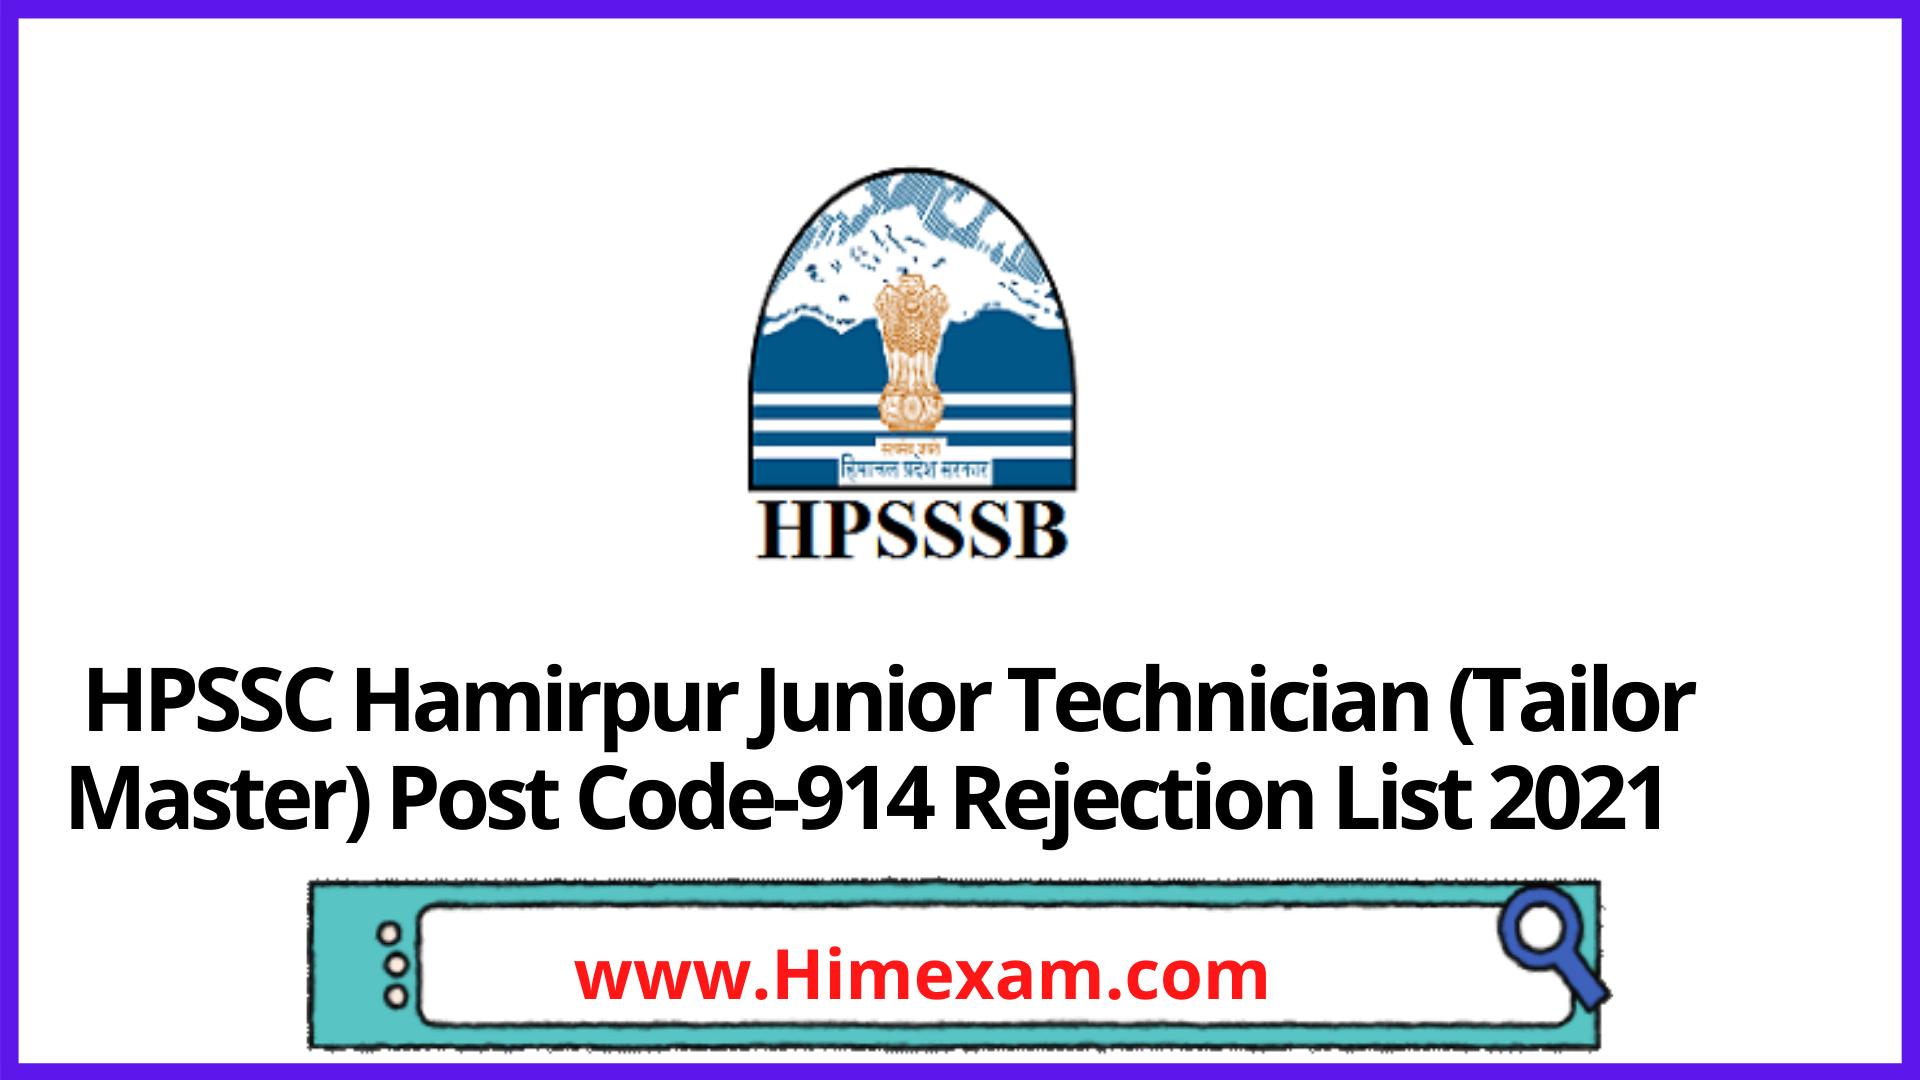 HPSSC Hamirpur Junior Technician (Tailor Master) Post Code-914 Rejection List 2021